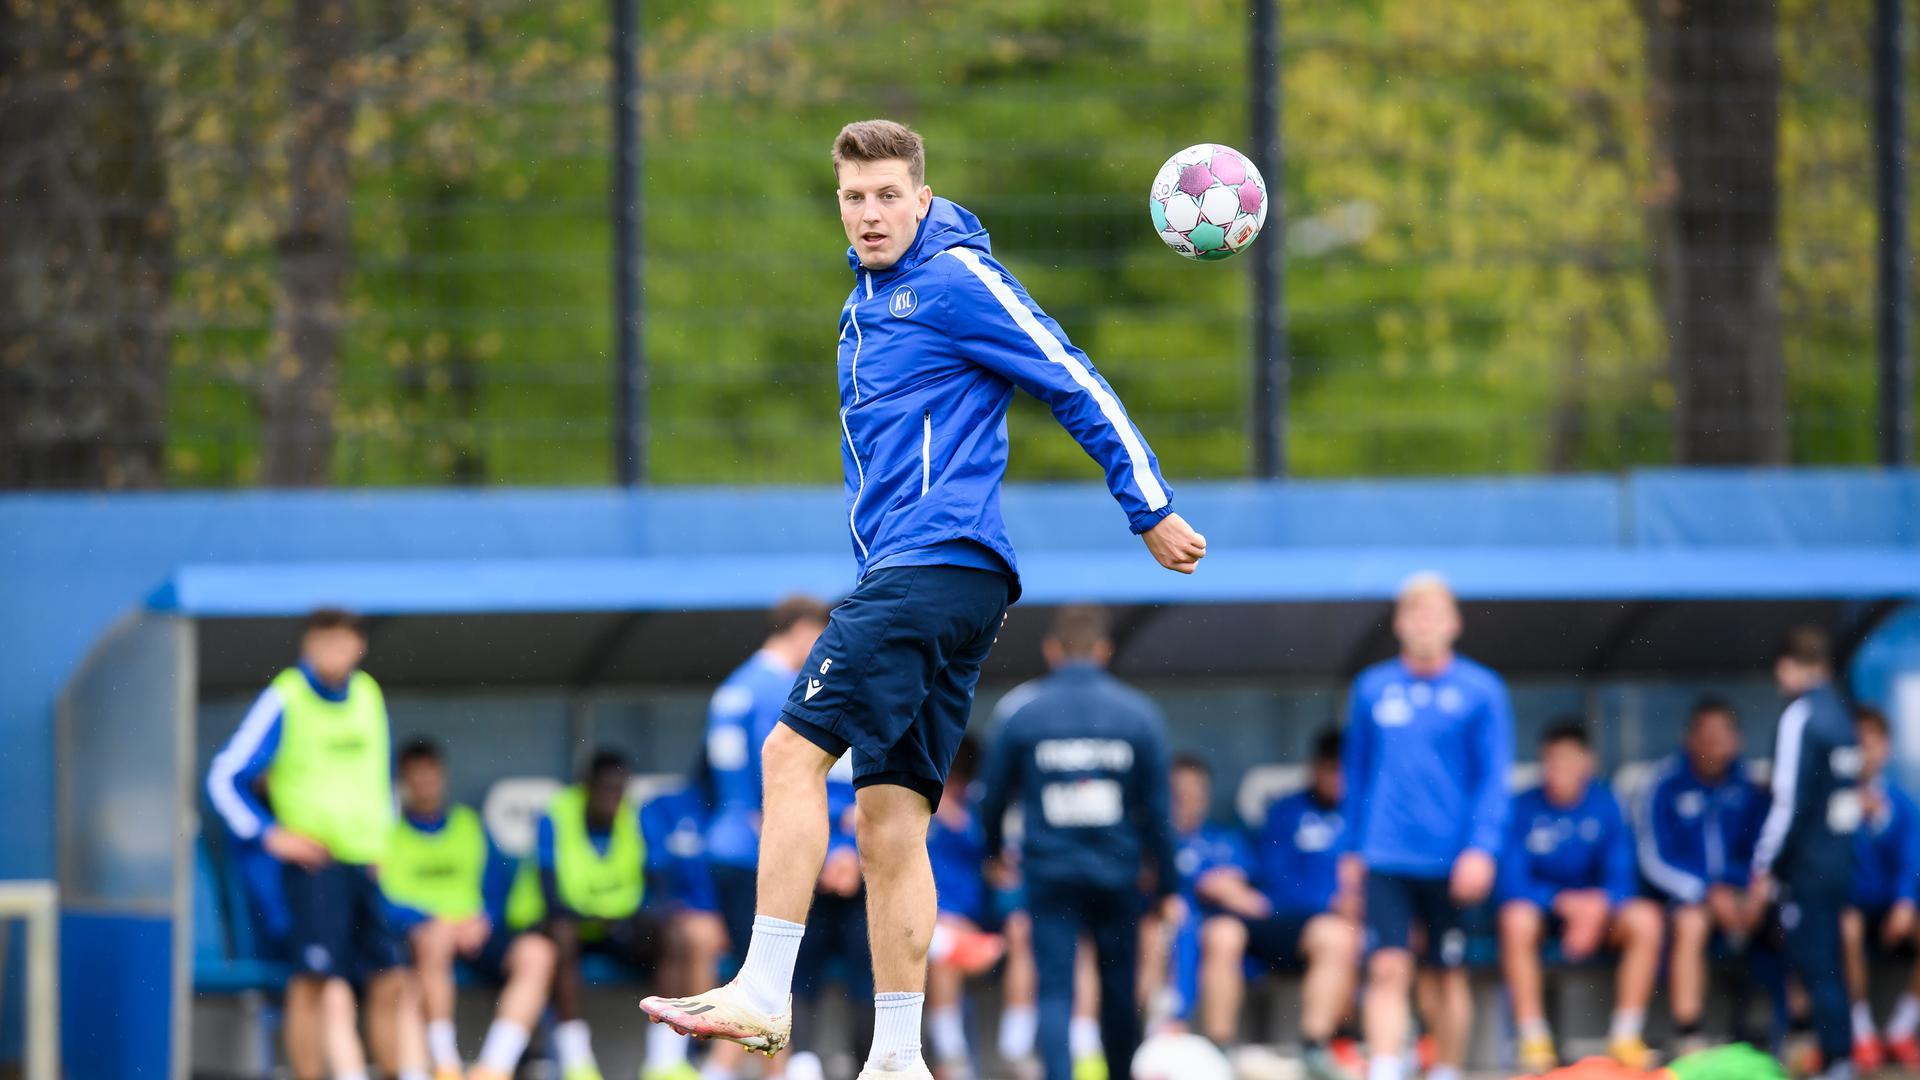 Kevin Wimmer (KSC) am Ball.  GES/ Fussball/ 2. Bundesliga: Karlsruher SC - Training, 06.05.2021  Football/Soccer: 2. Bundesliga: KSC Training, Karlsruhe, May 6, 2021